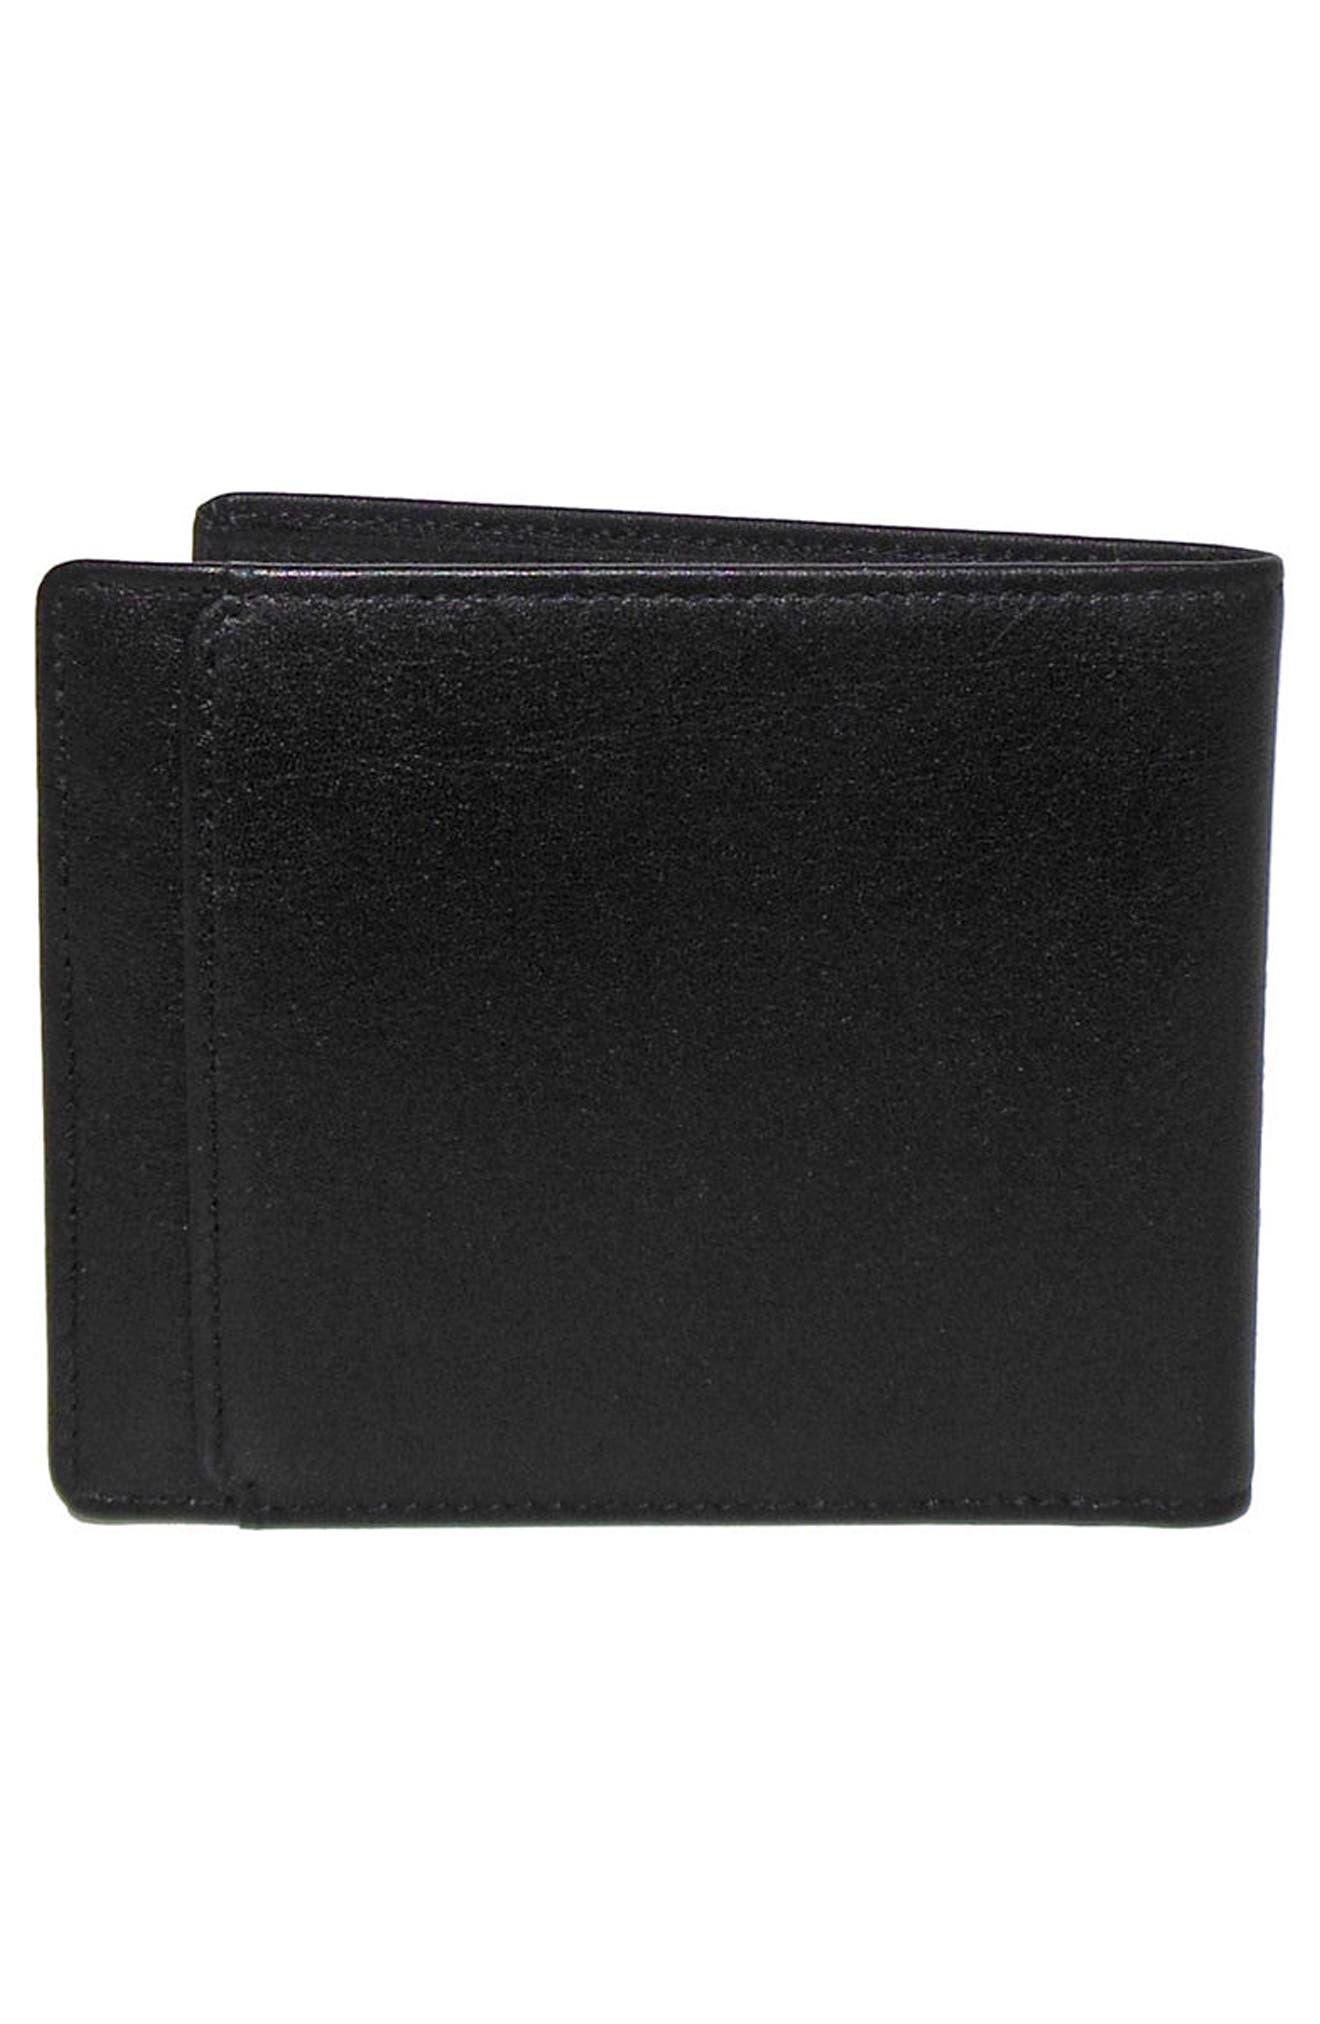 Grant Leather Wallet,                             Alternate thumbnail 4, color,                             Black